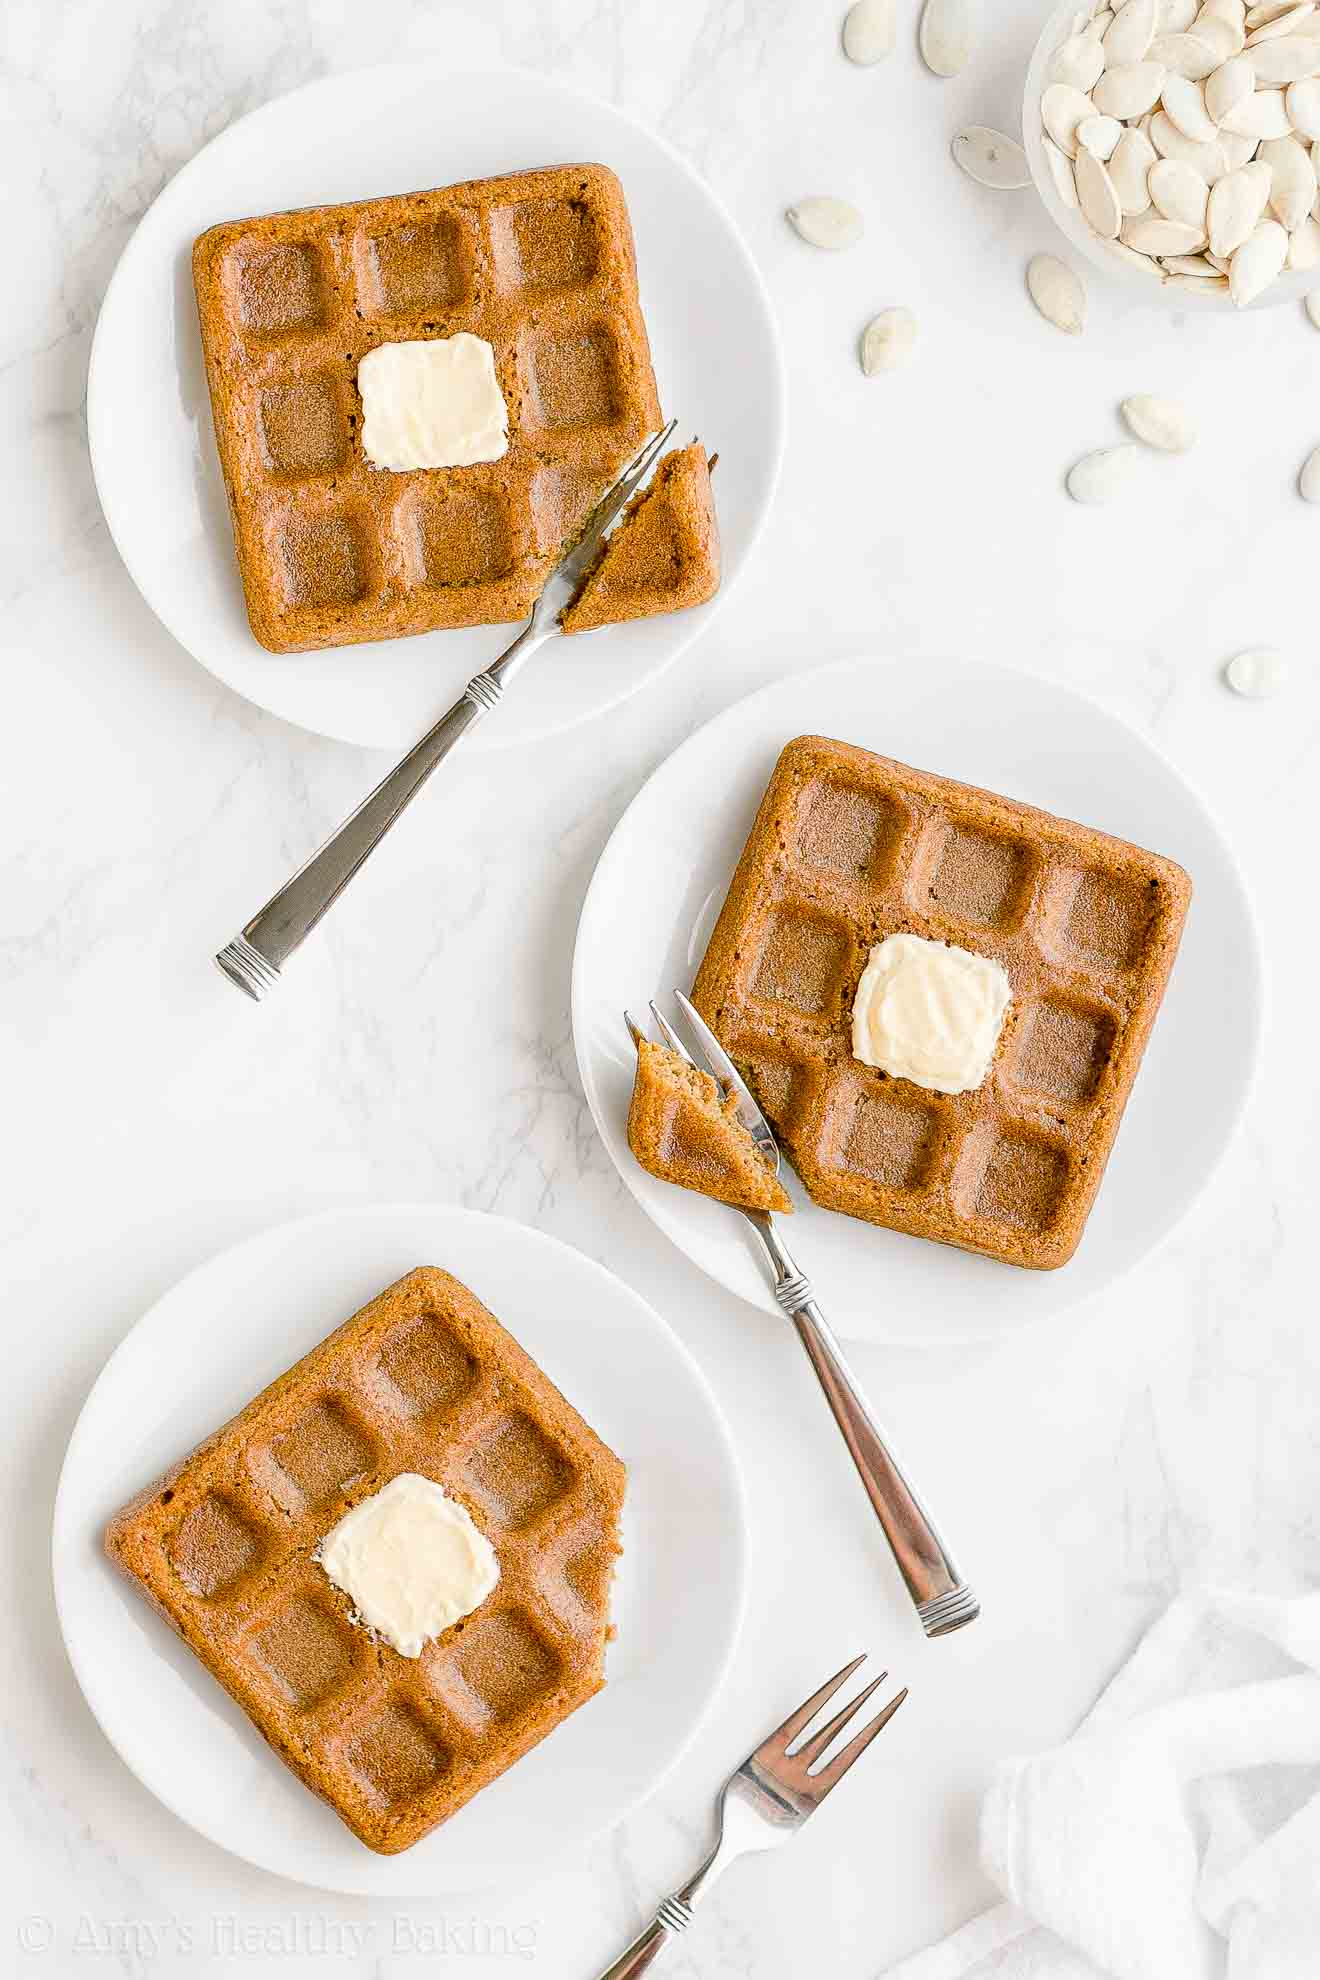 Best Easy Healthy Fluffy Whole Wheat Pumpkin Waffles